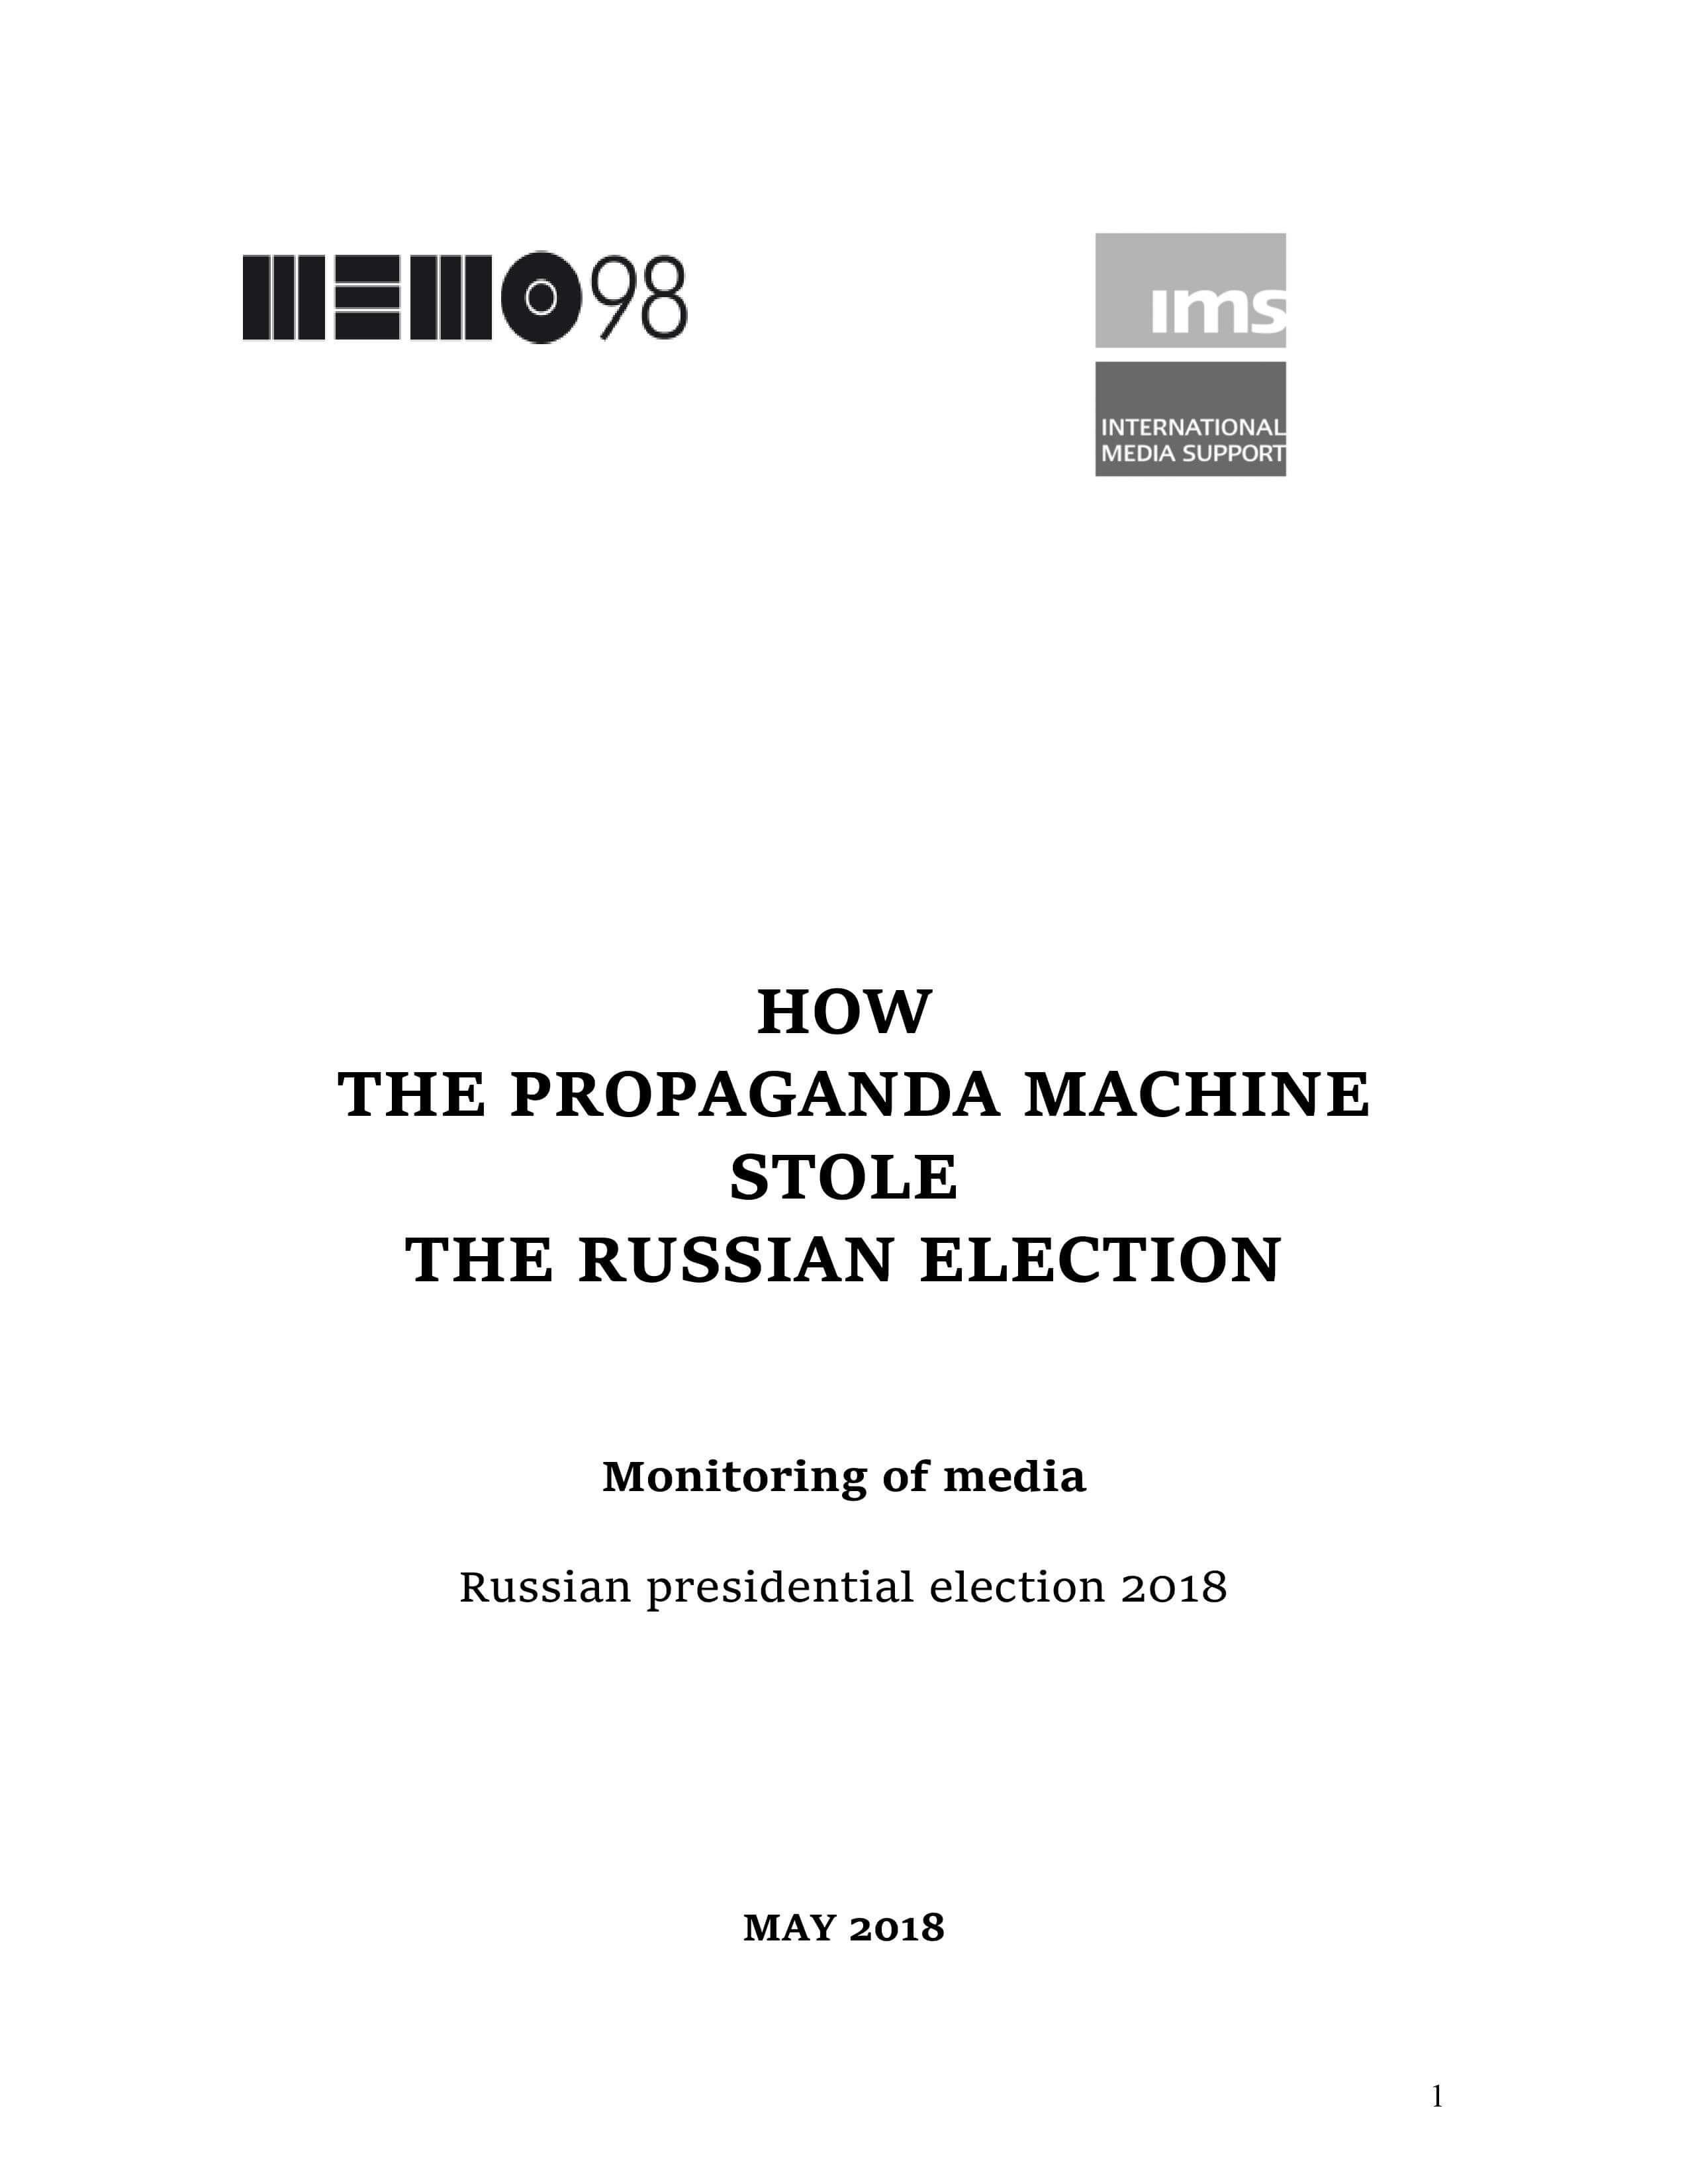 How the propaganda machine stole the Russian election